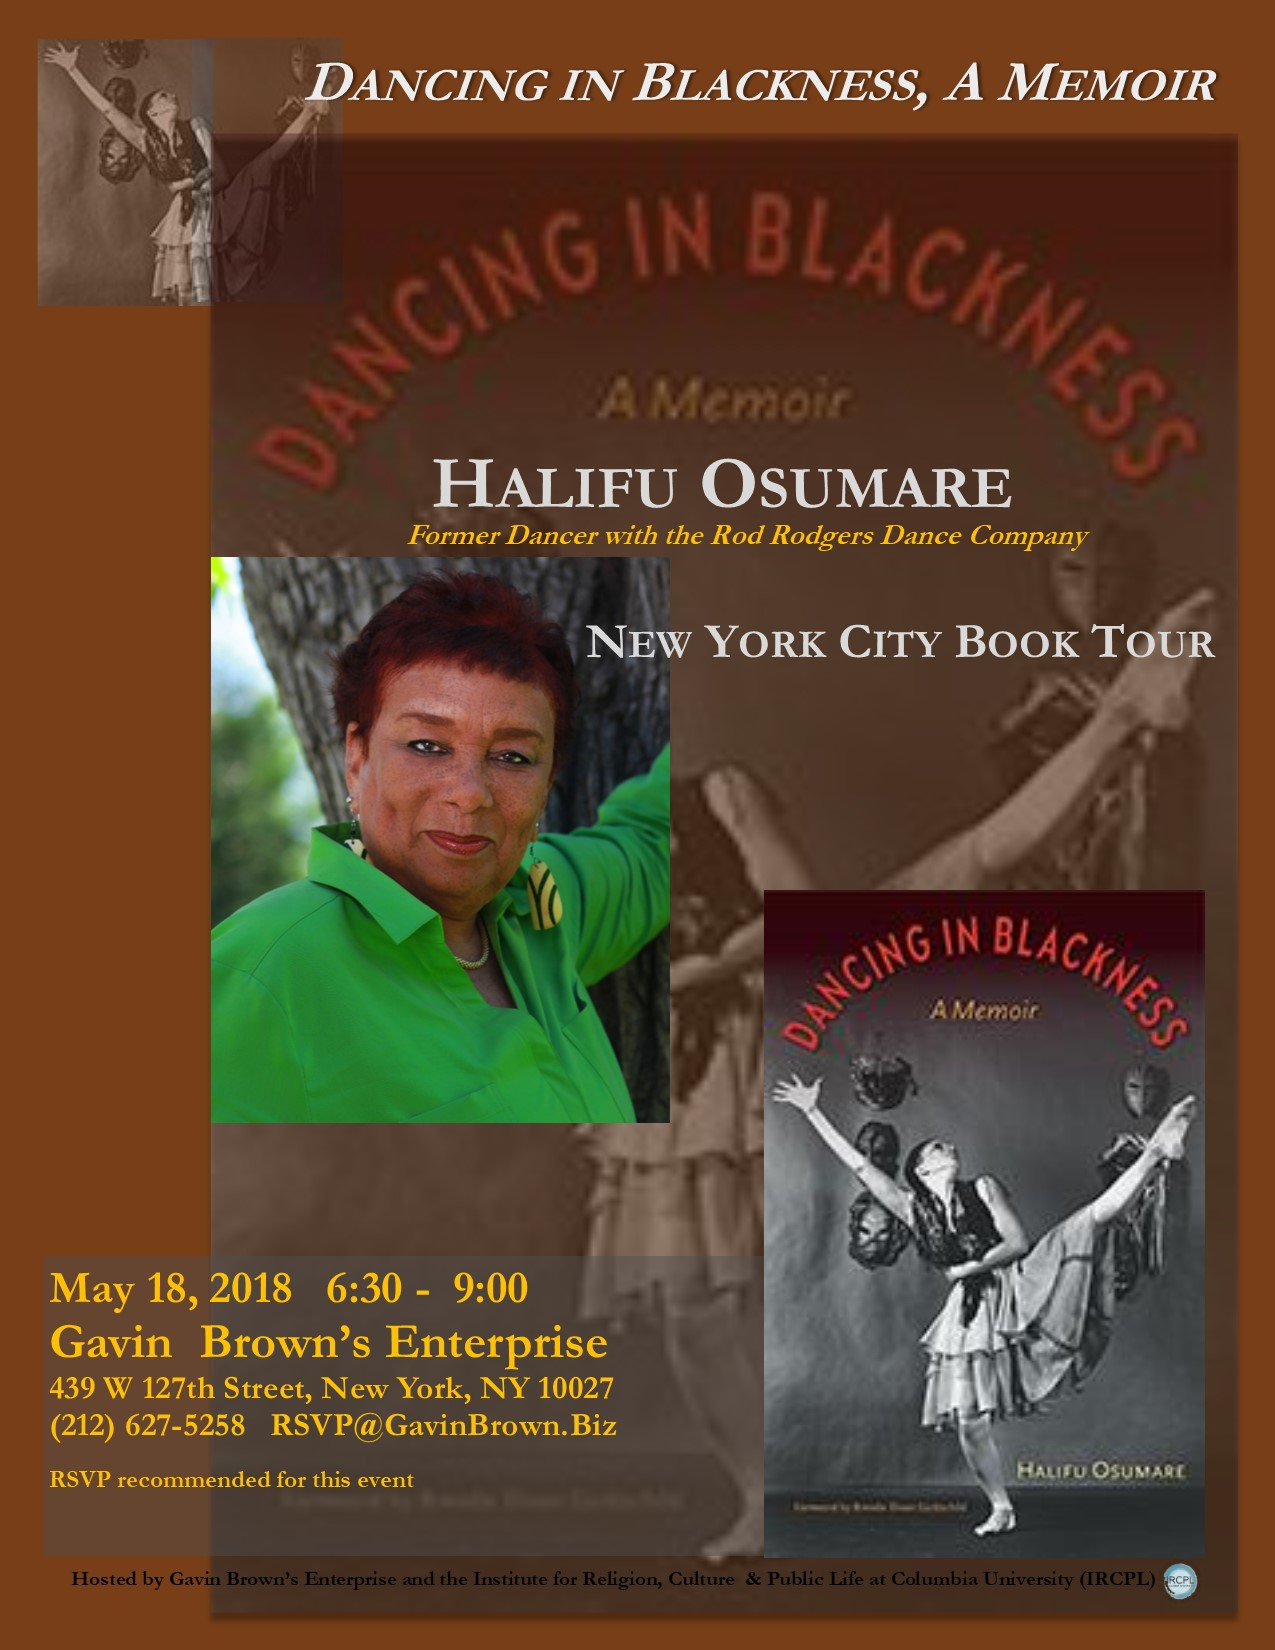 GavinBrown_NYC_Dancing in Blackness_